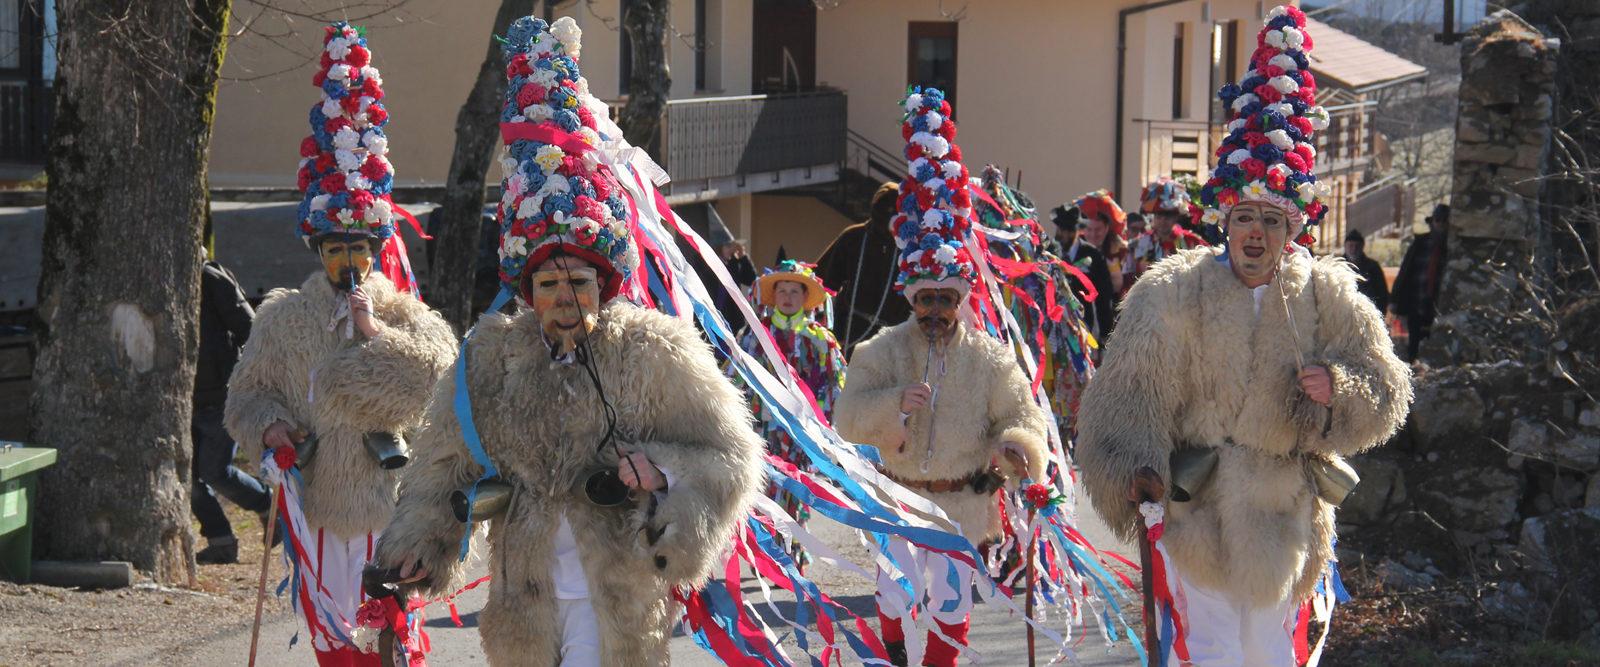 CarnivalKing Hrusica